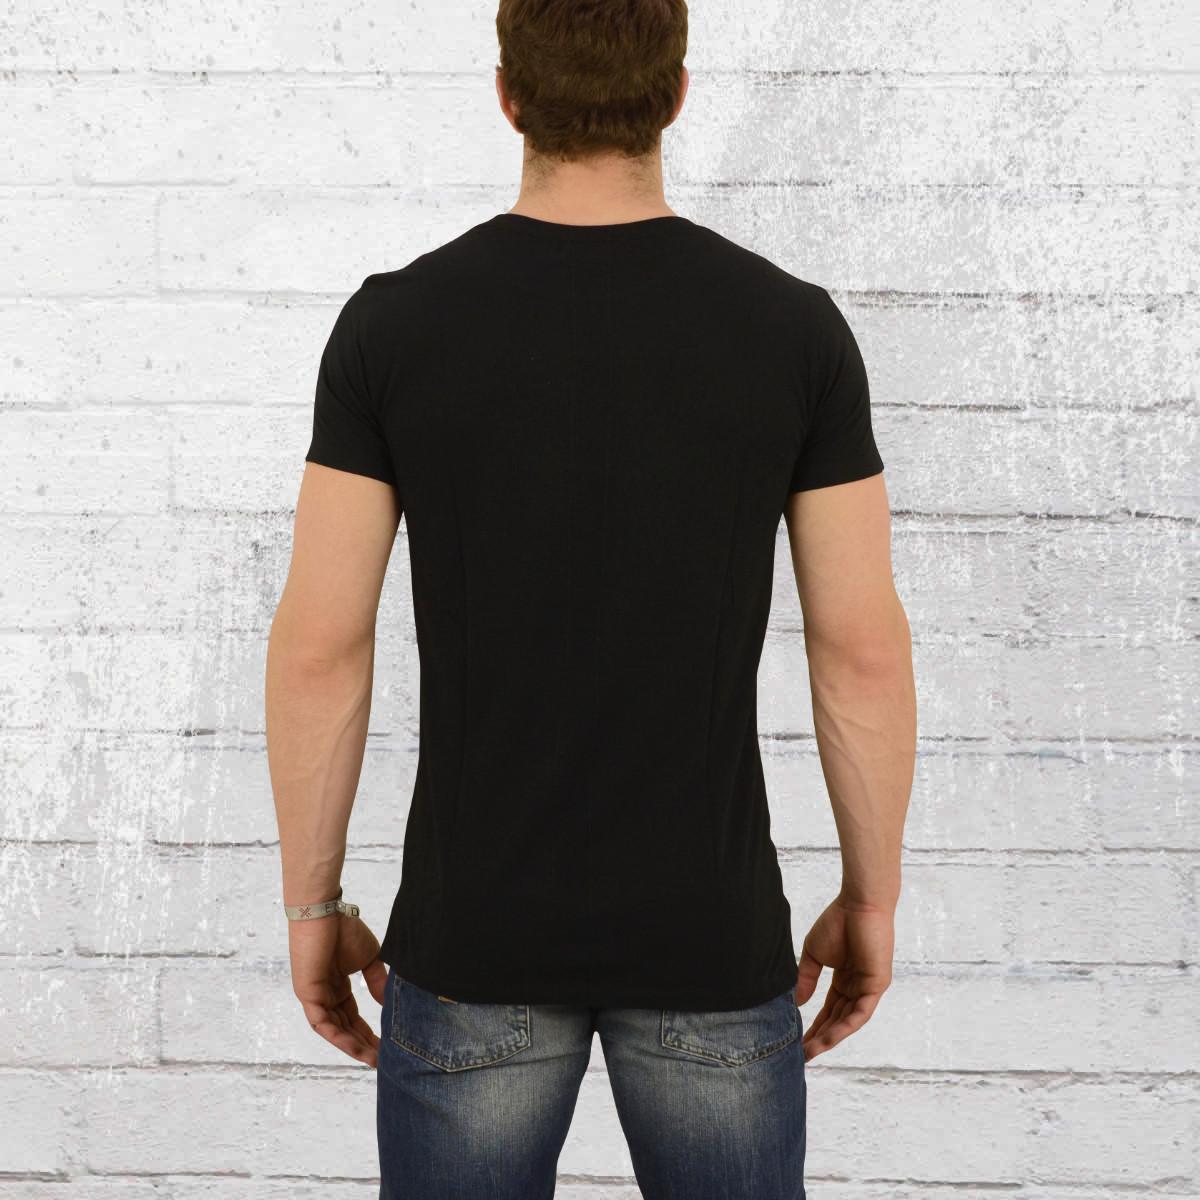 buy online 092f9 c46b6 Jetzt bestellen | Religion Clothing T-Shirt Herren Pray ...